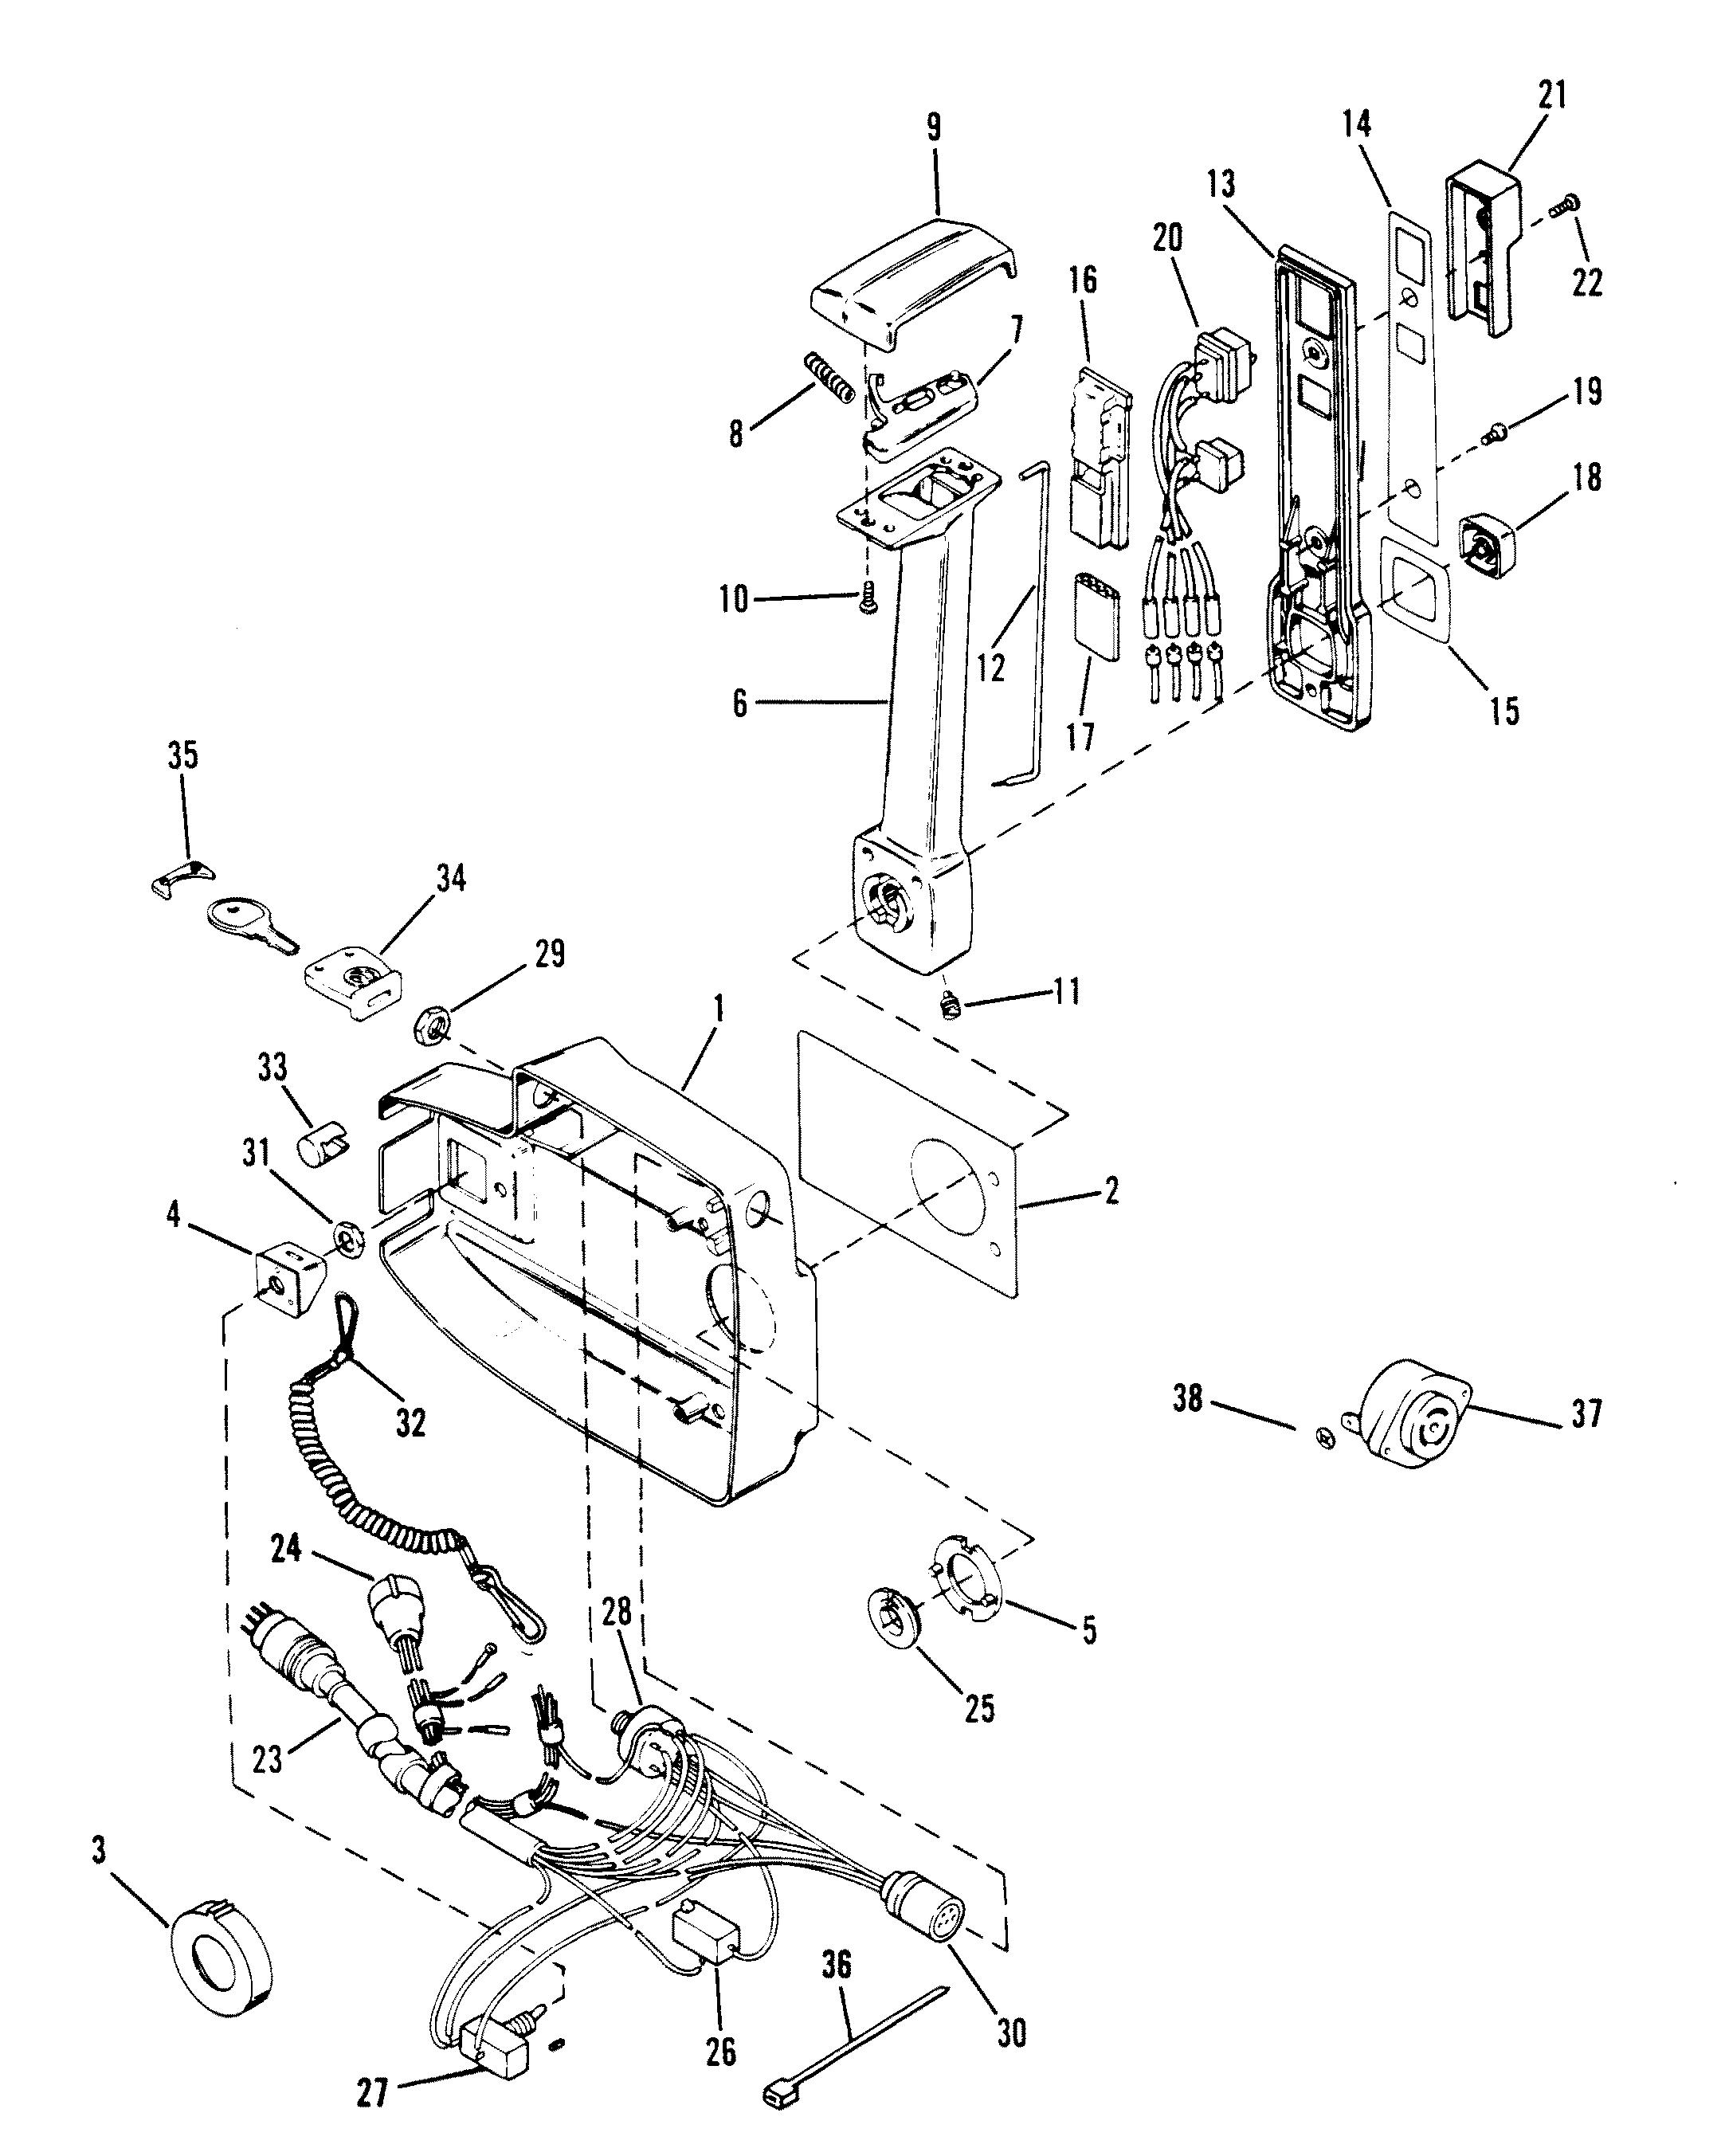 1999 Regal Boat 4 3l Throttle Body Wiring Diagram